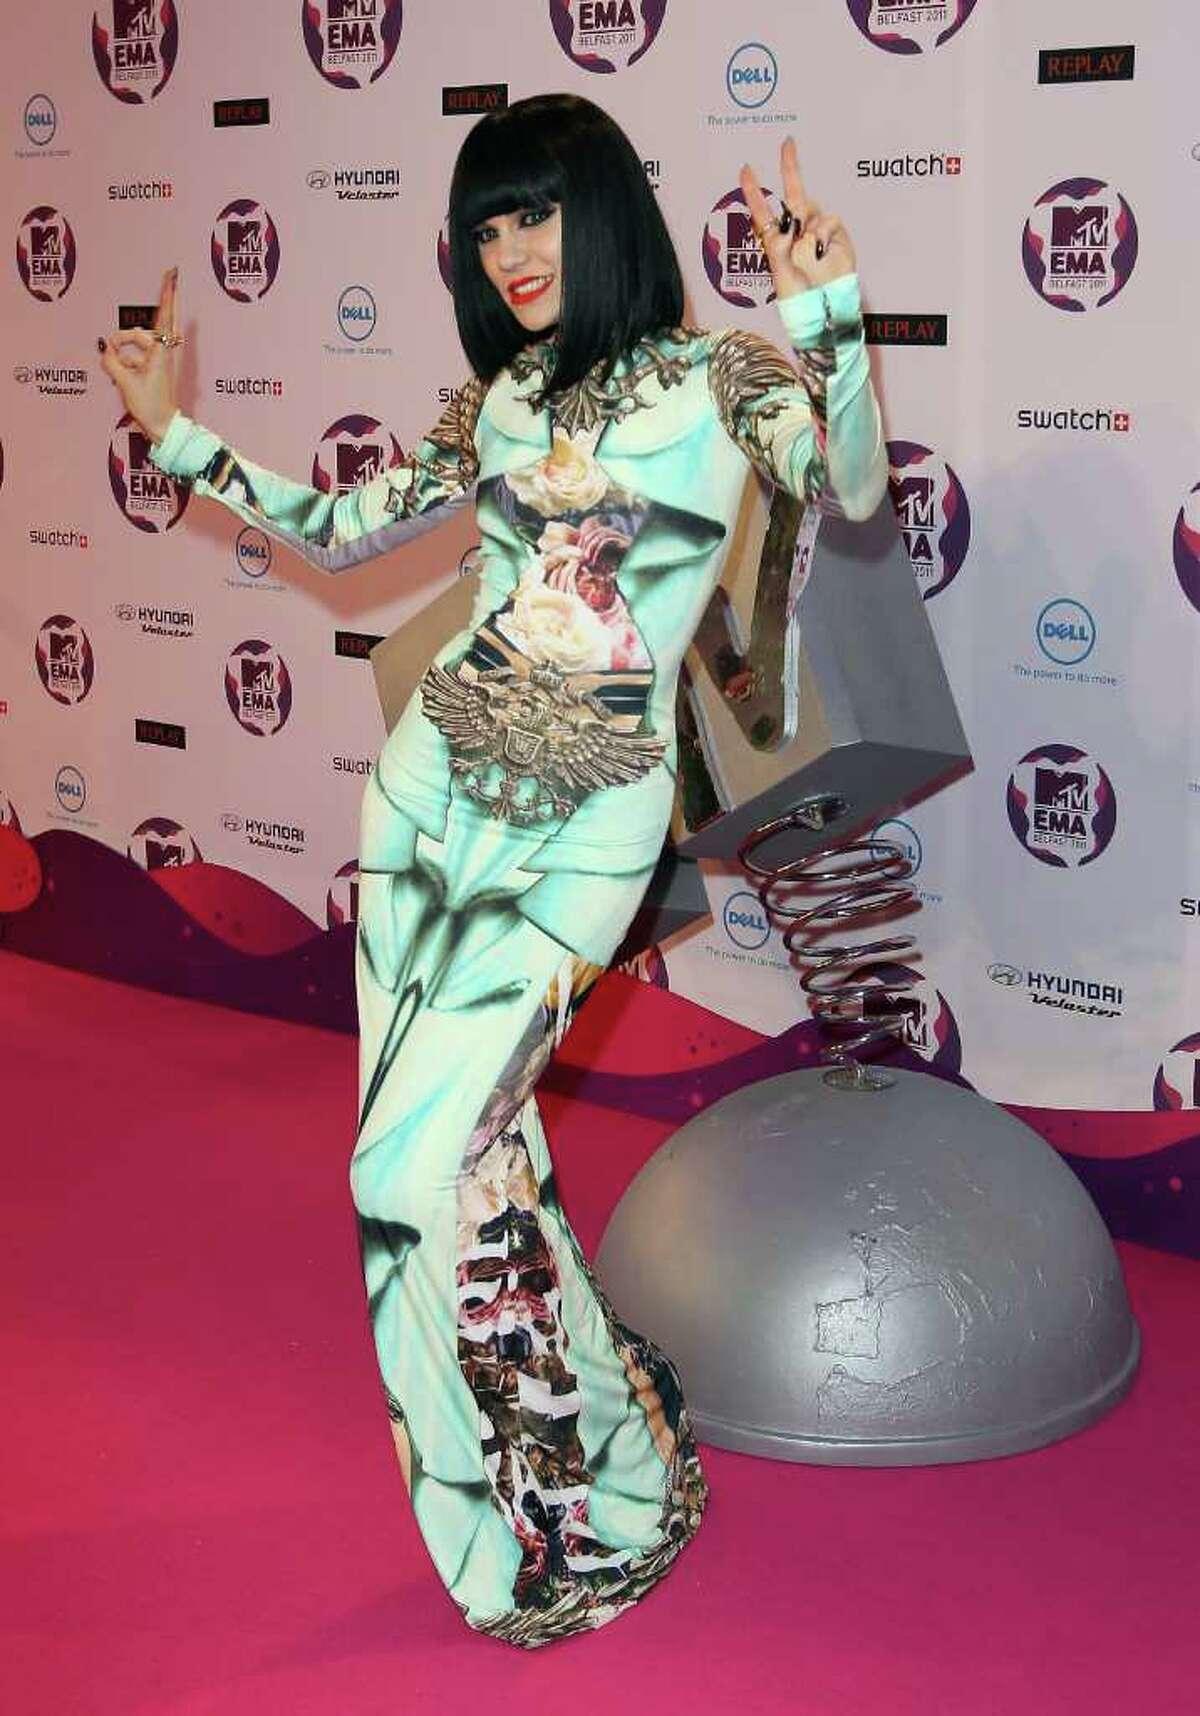 BELFAST, NORTHERN IRELAND - NOVEMBER 06: Singer Jessie J attends the MTV Europe Music Awards 2011 at Odyssey Arena on November 6, 2011 in Belfast, Northern Ireland.